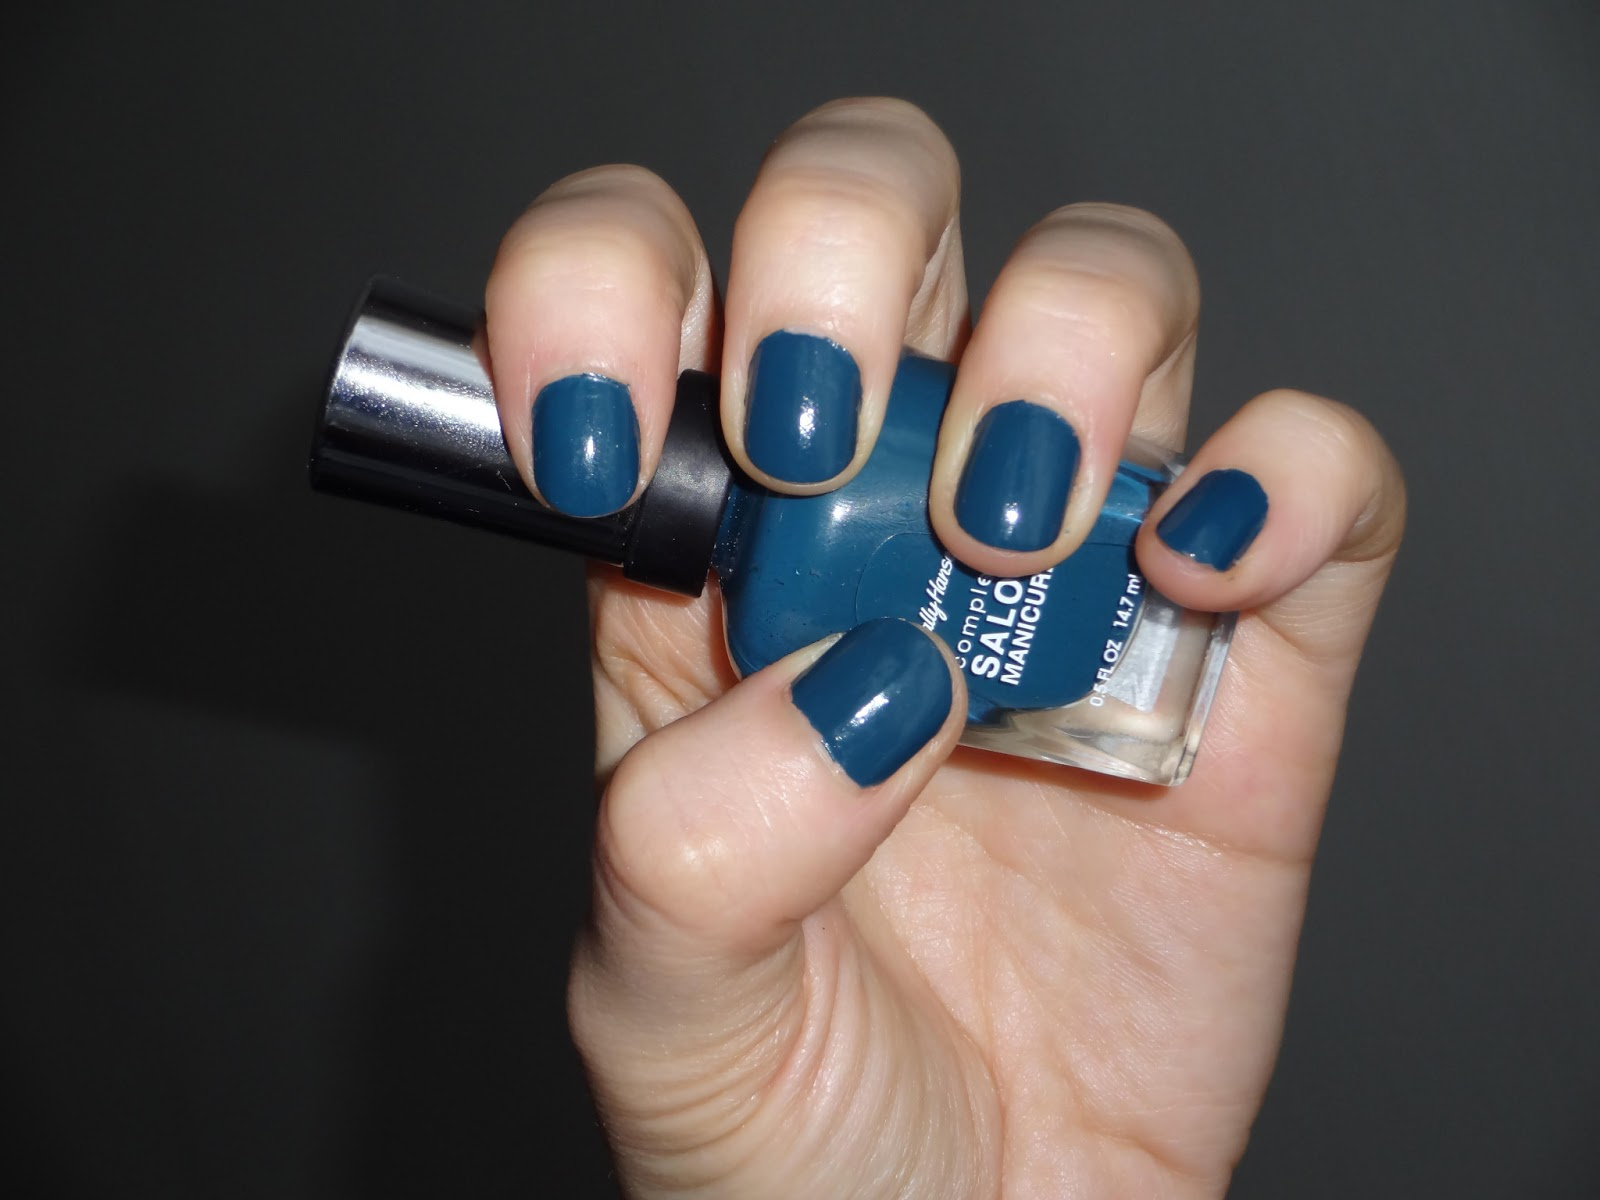 Ongles bleu marine et or - Ongle bleu marine ...